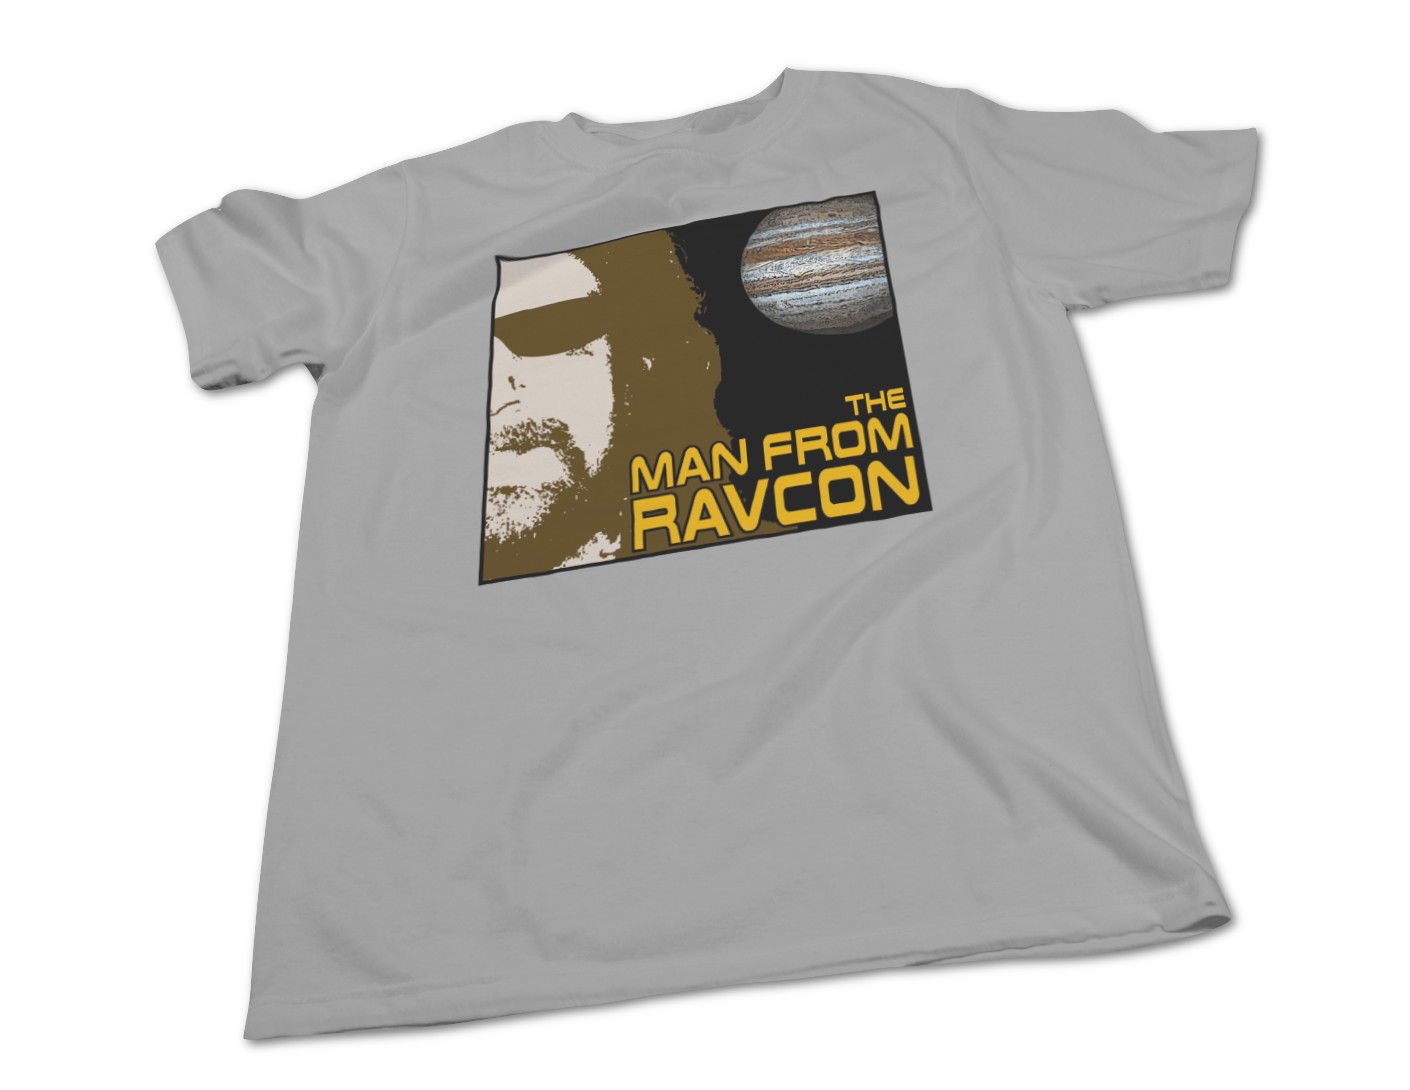 Man from ravcon man from ravcon logo 1479919071